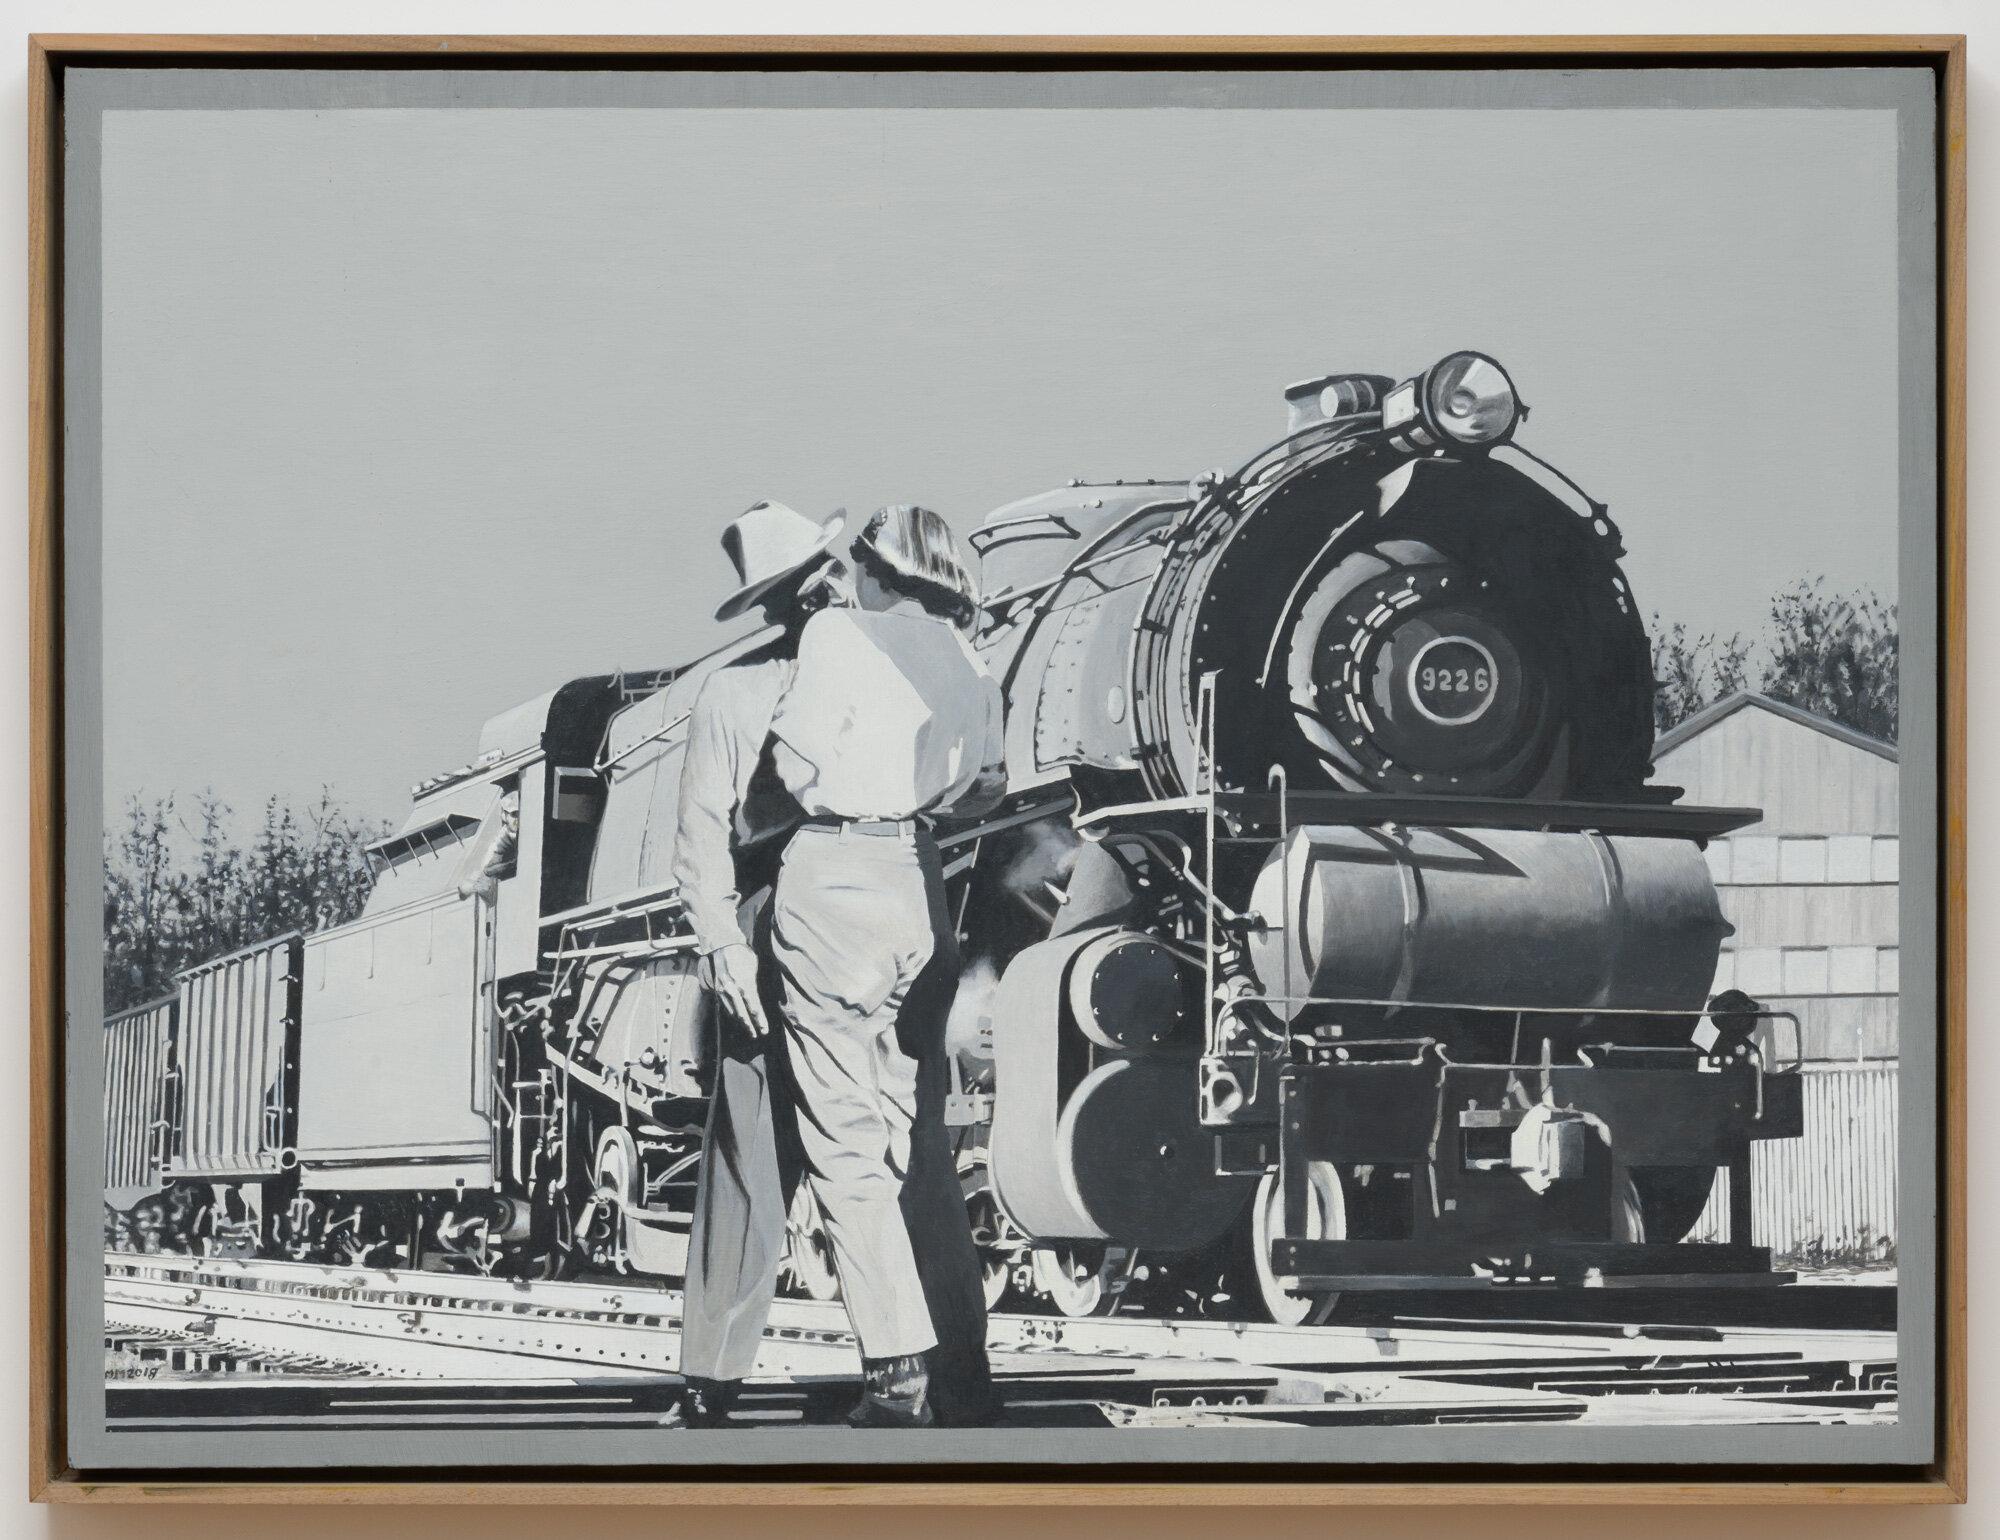 Martin Mull    Adios , 2018  Oil on Linen  30 x 40 in.